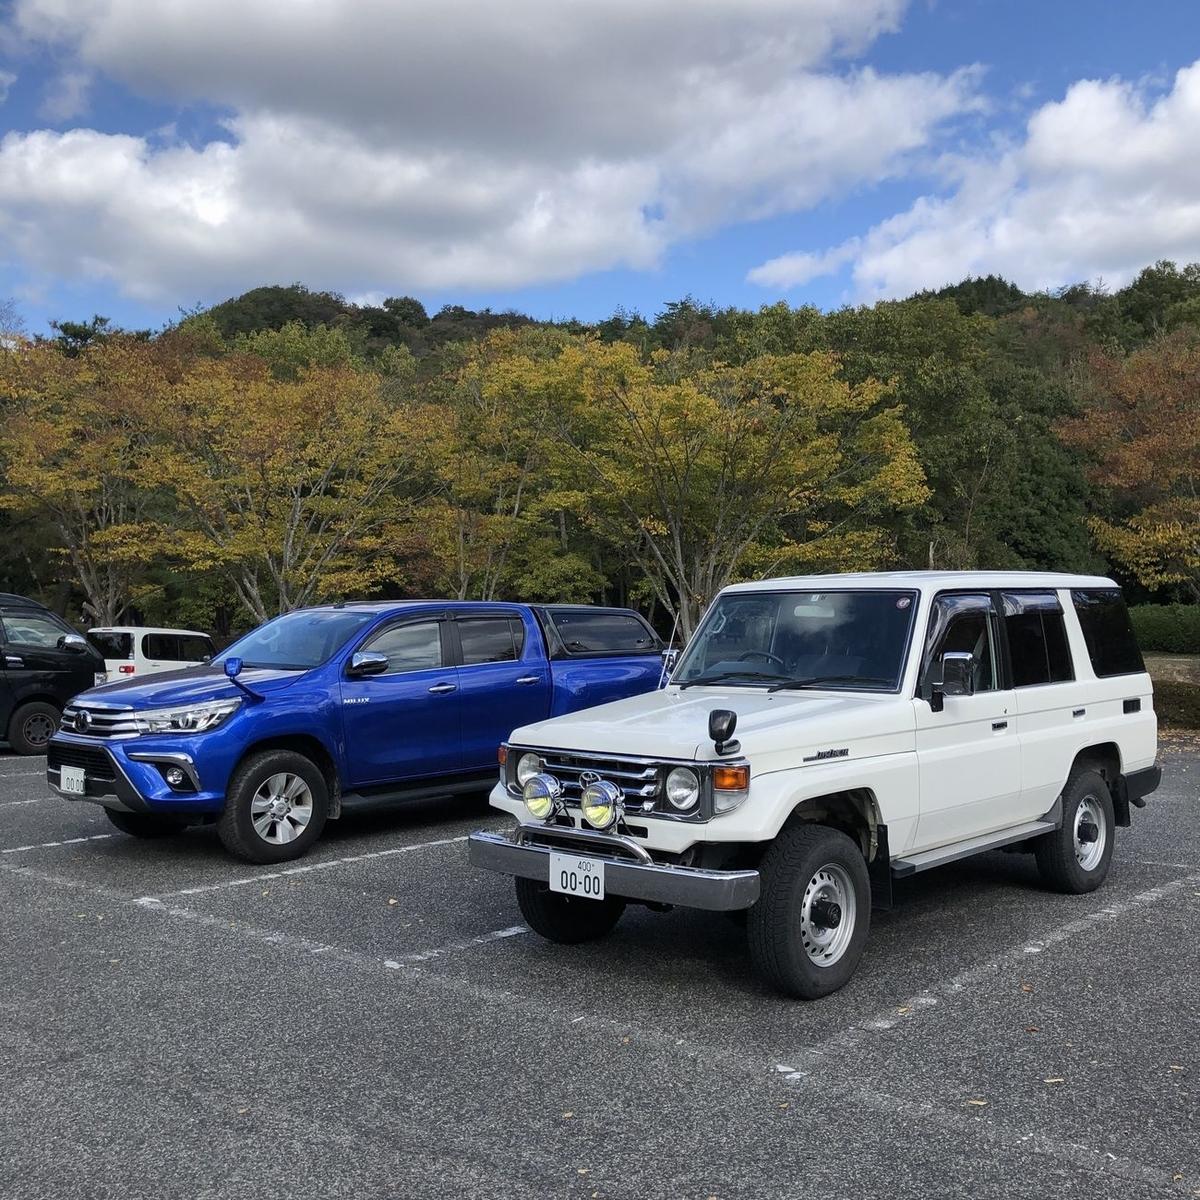 f:id:shiratsume:20191106173213j:plain